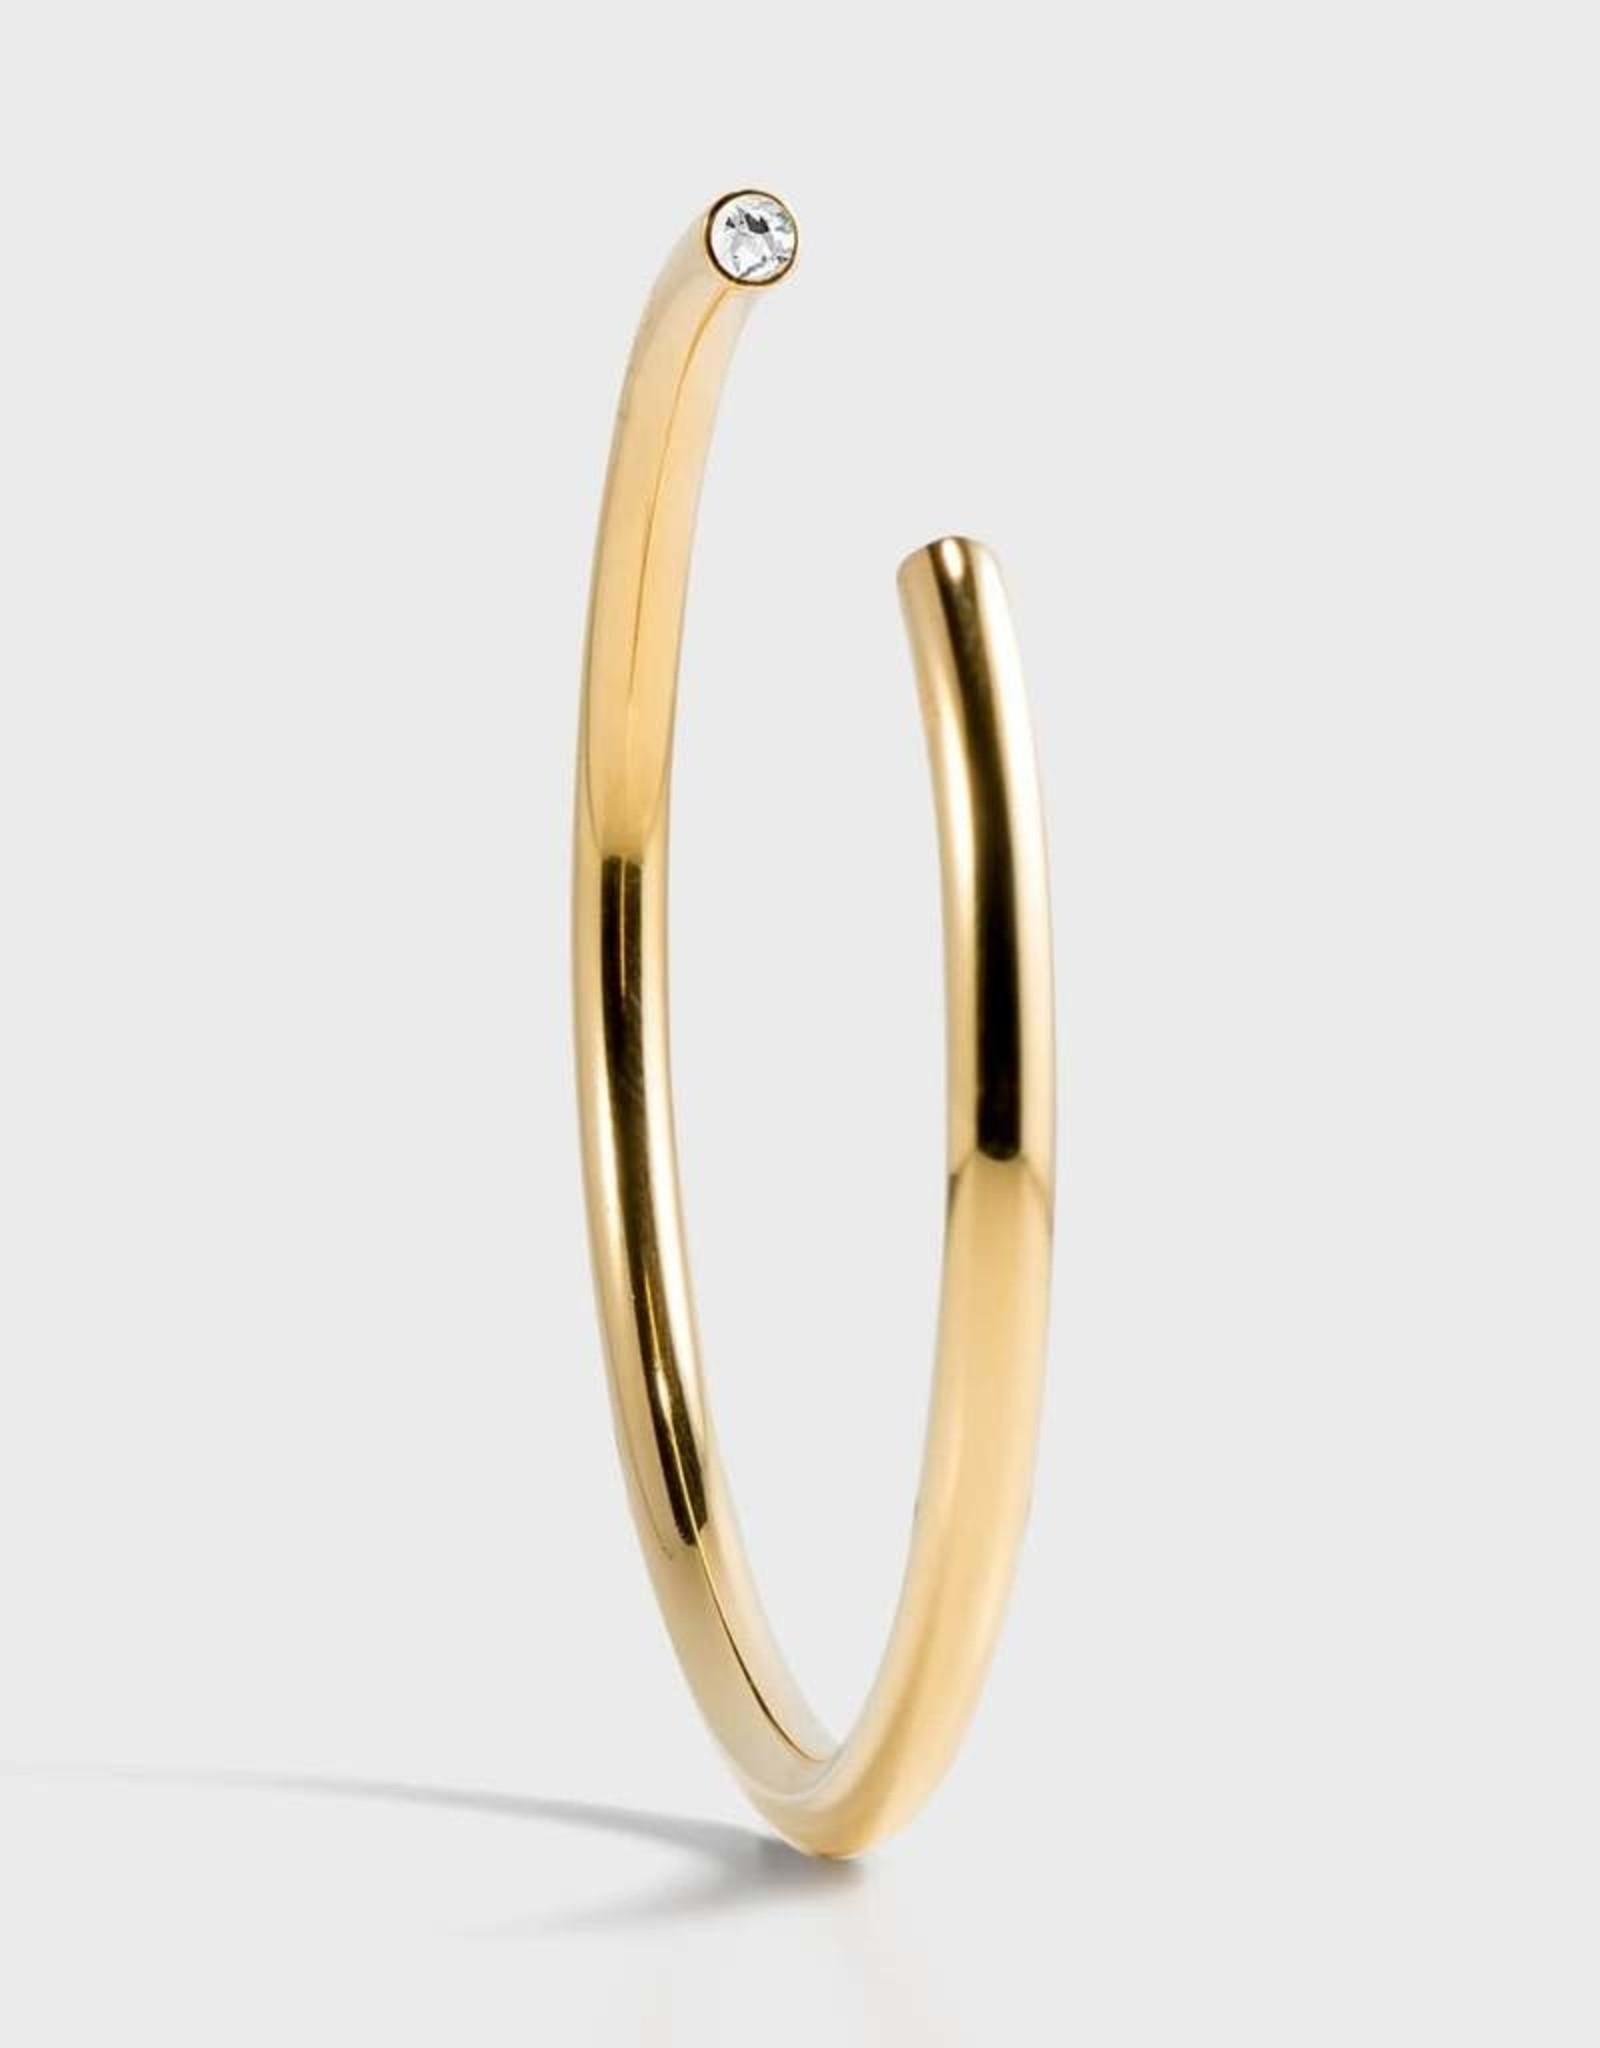 Stella Vale Birthstone Bracelet - April/Gold